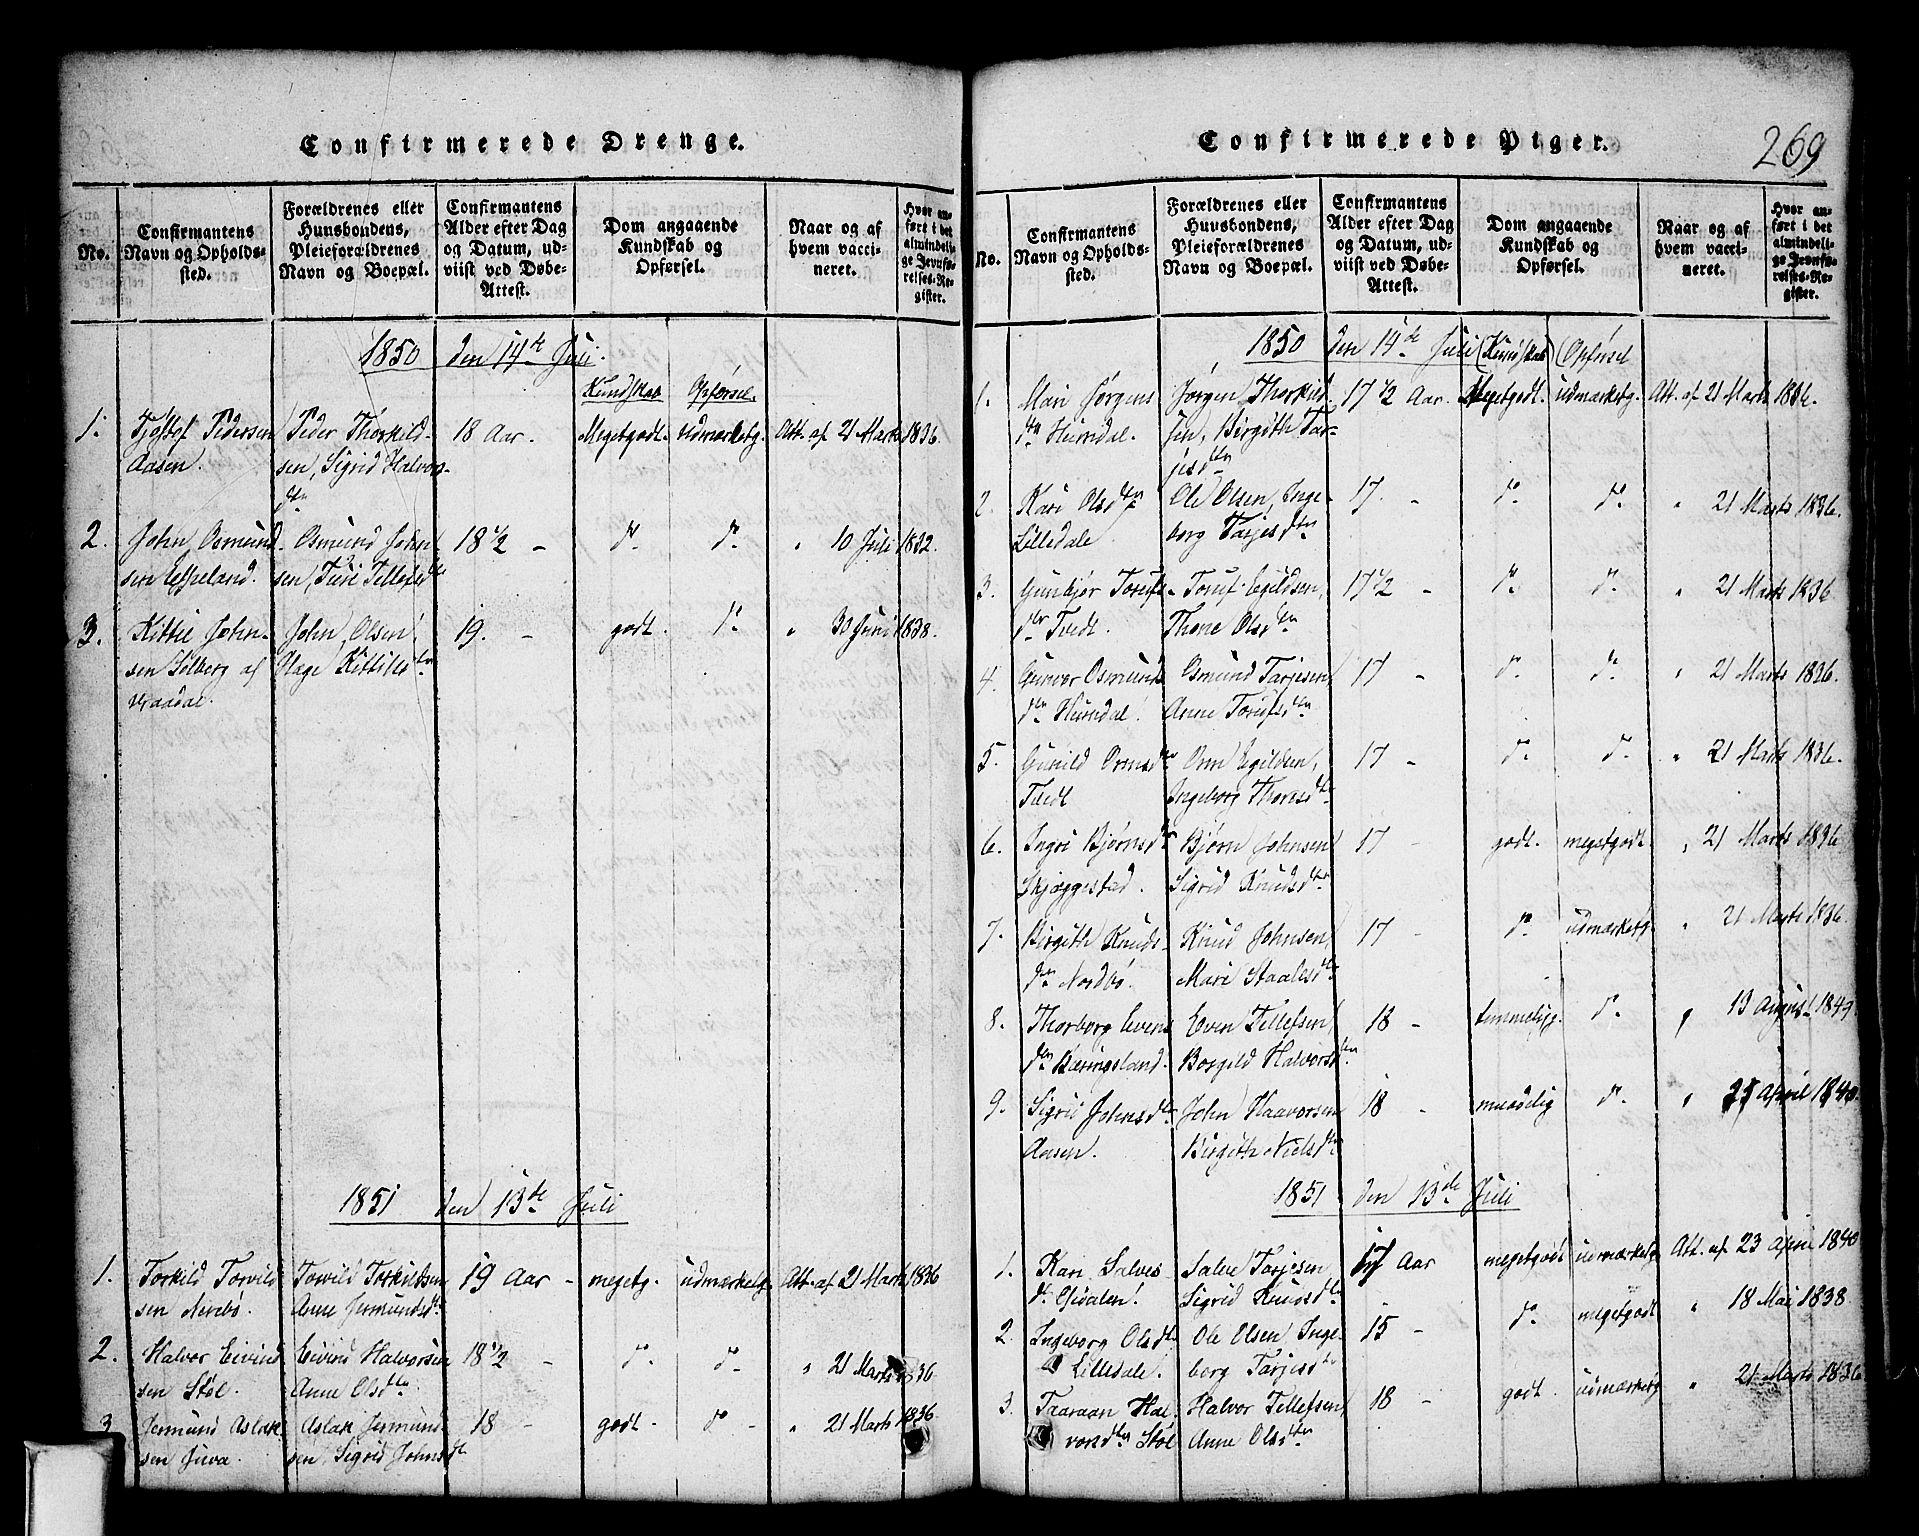 SAKO, Nissedal kirkebøker, G/Gb/L0001: Klokkerbok nr. II 1, 1814-1862, s. 269